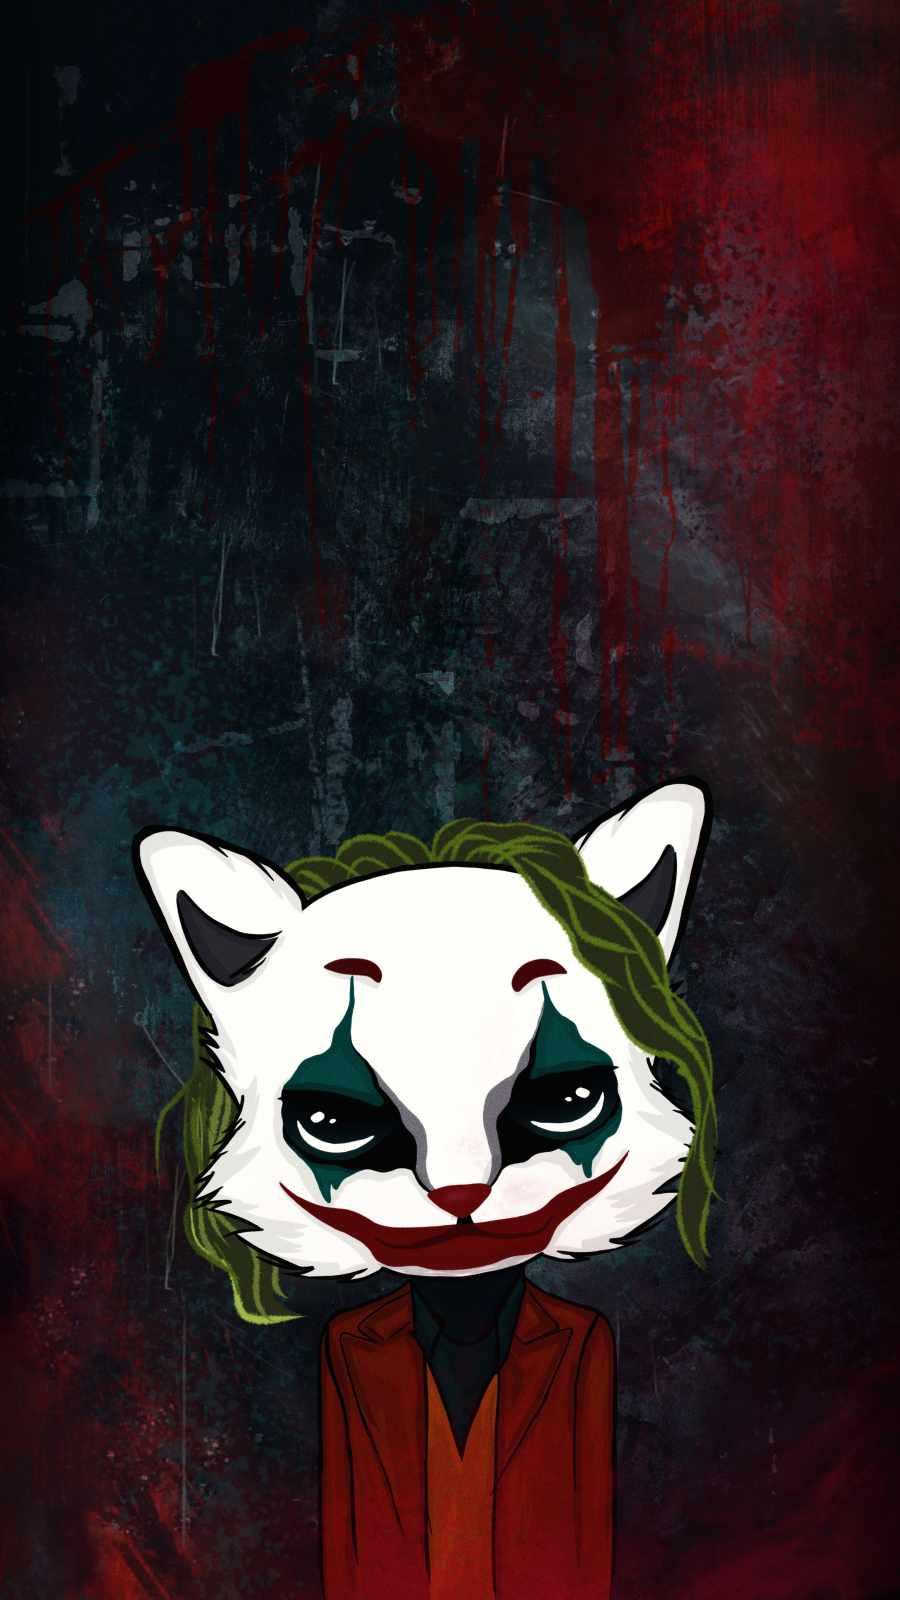 Joker Cat iPhone Wallpaper